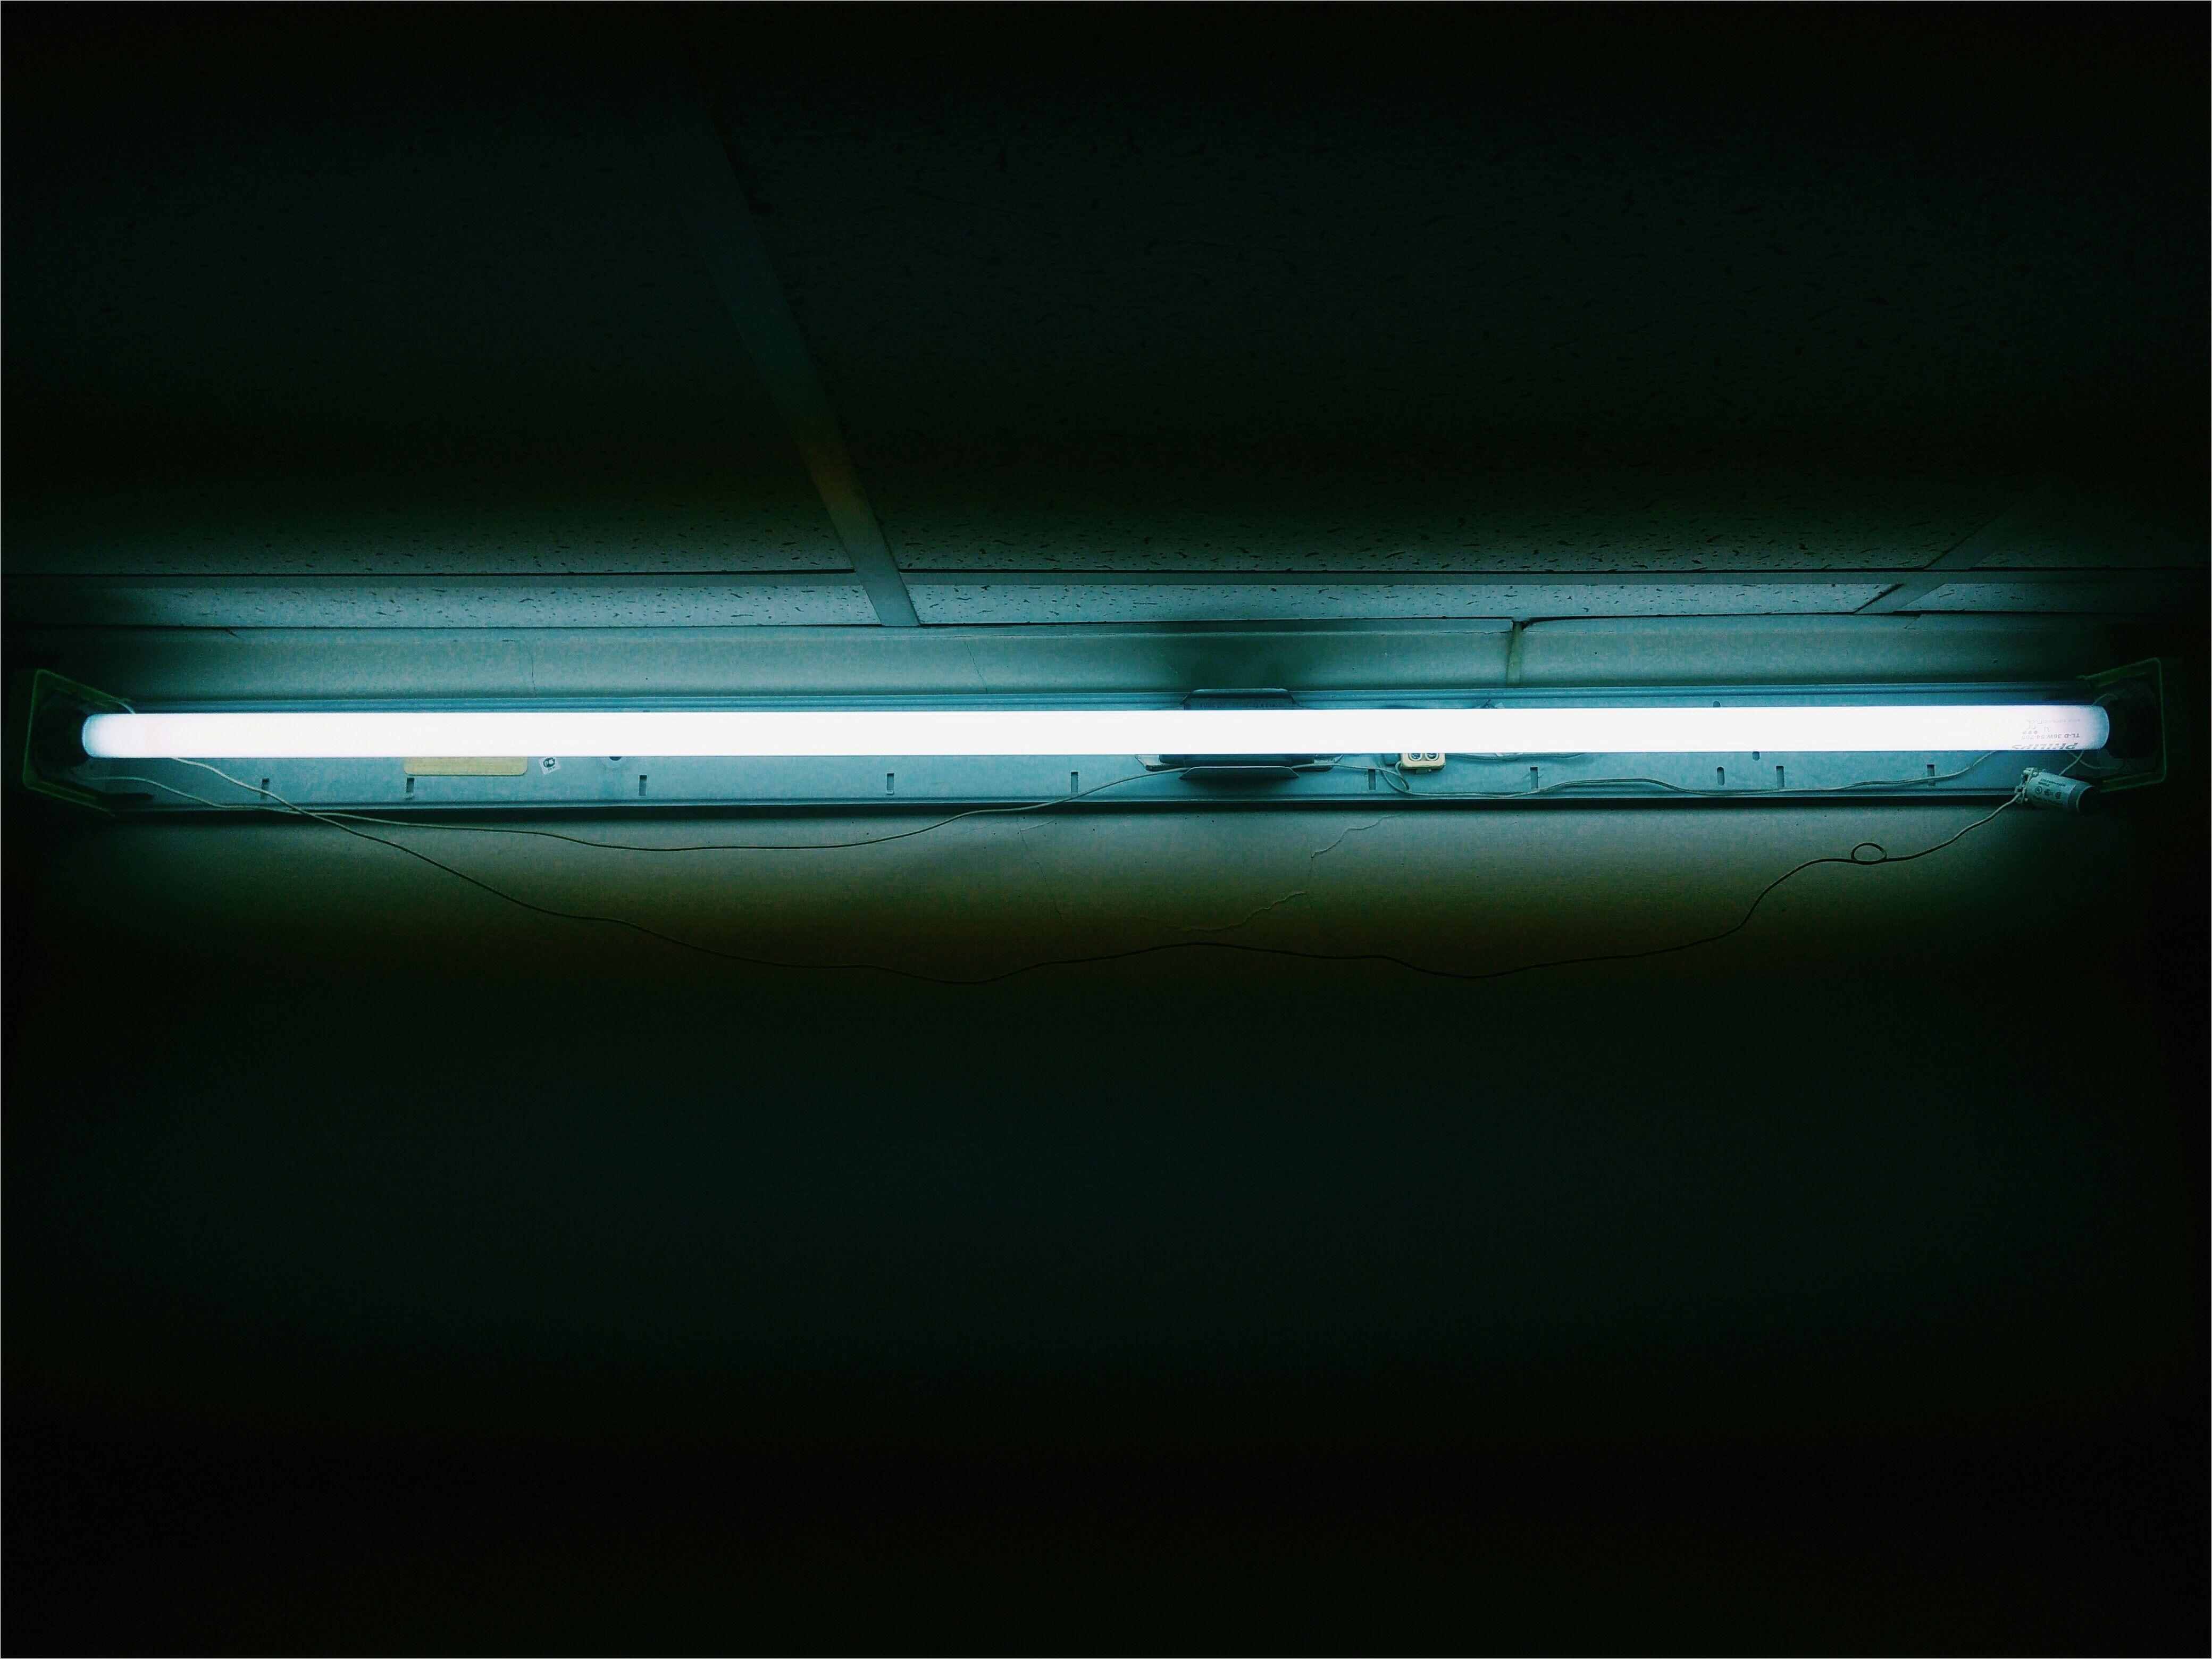 illuminated fluorescent light 564756121 577d1fca3df78cb62c59f3d7